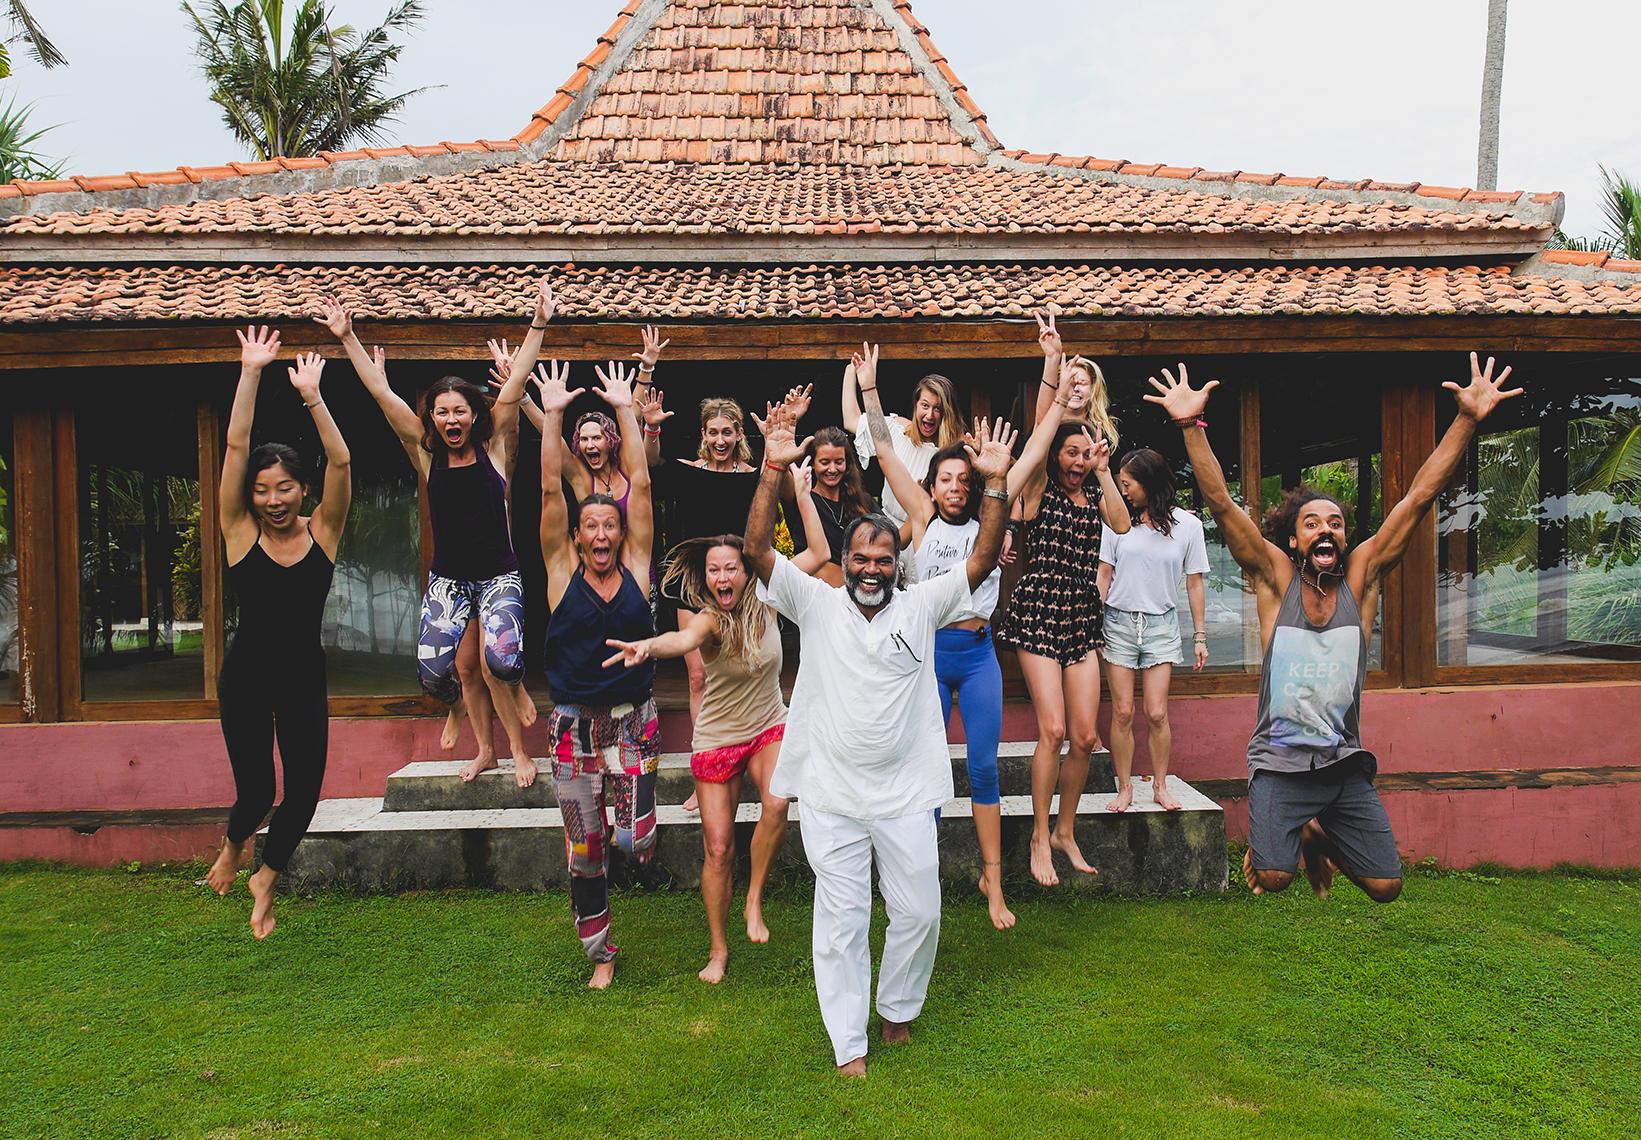 Exhale Yoga Retreats 300hr Yoga Teacher Training